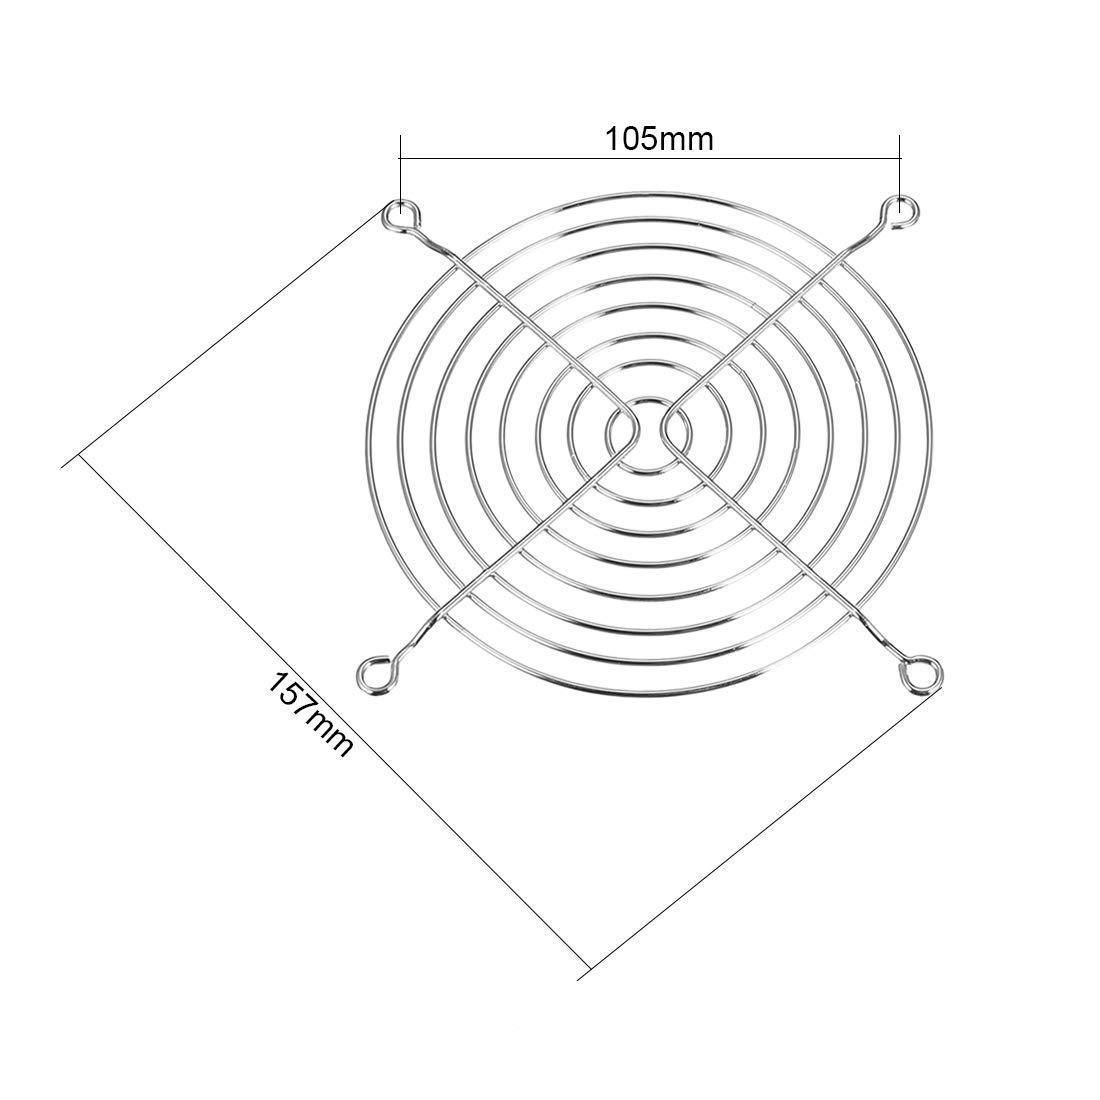 uxcell 10pcs Finger Guard Metal Fan Grill Protector for 120mm x 120mm Case Fan Silver Tone